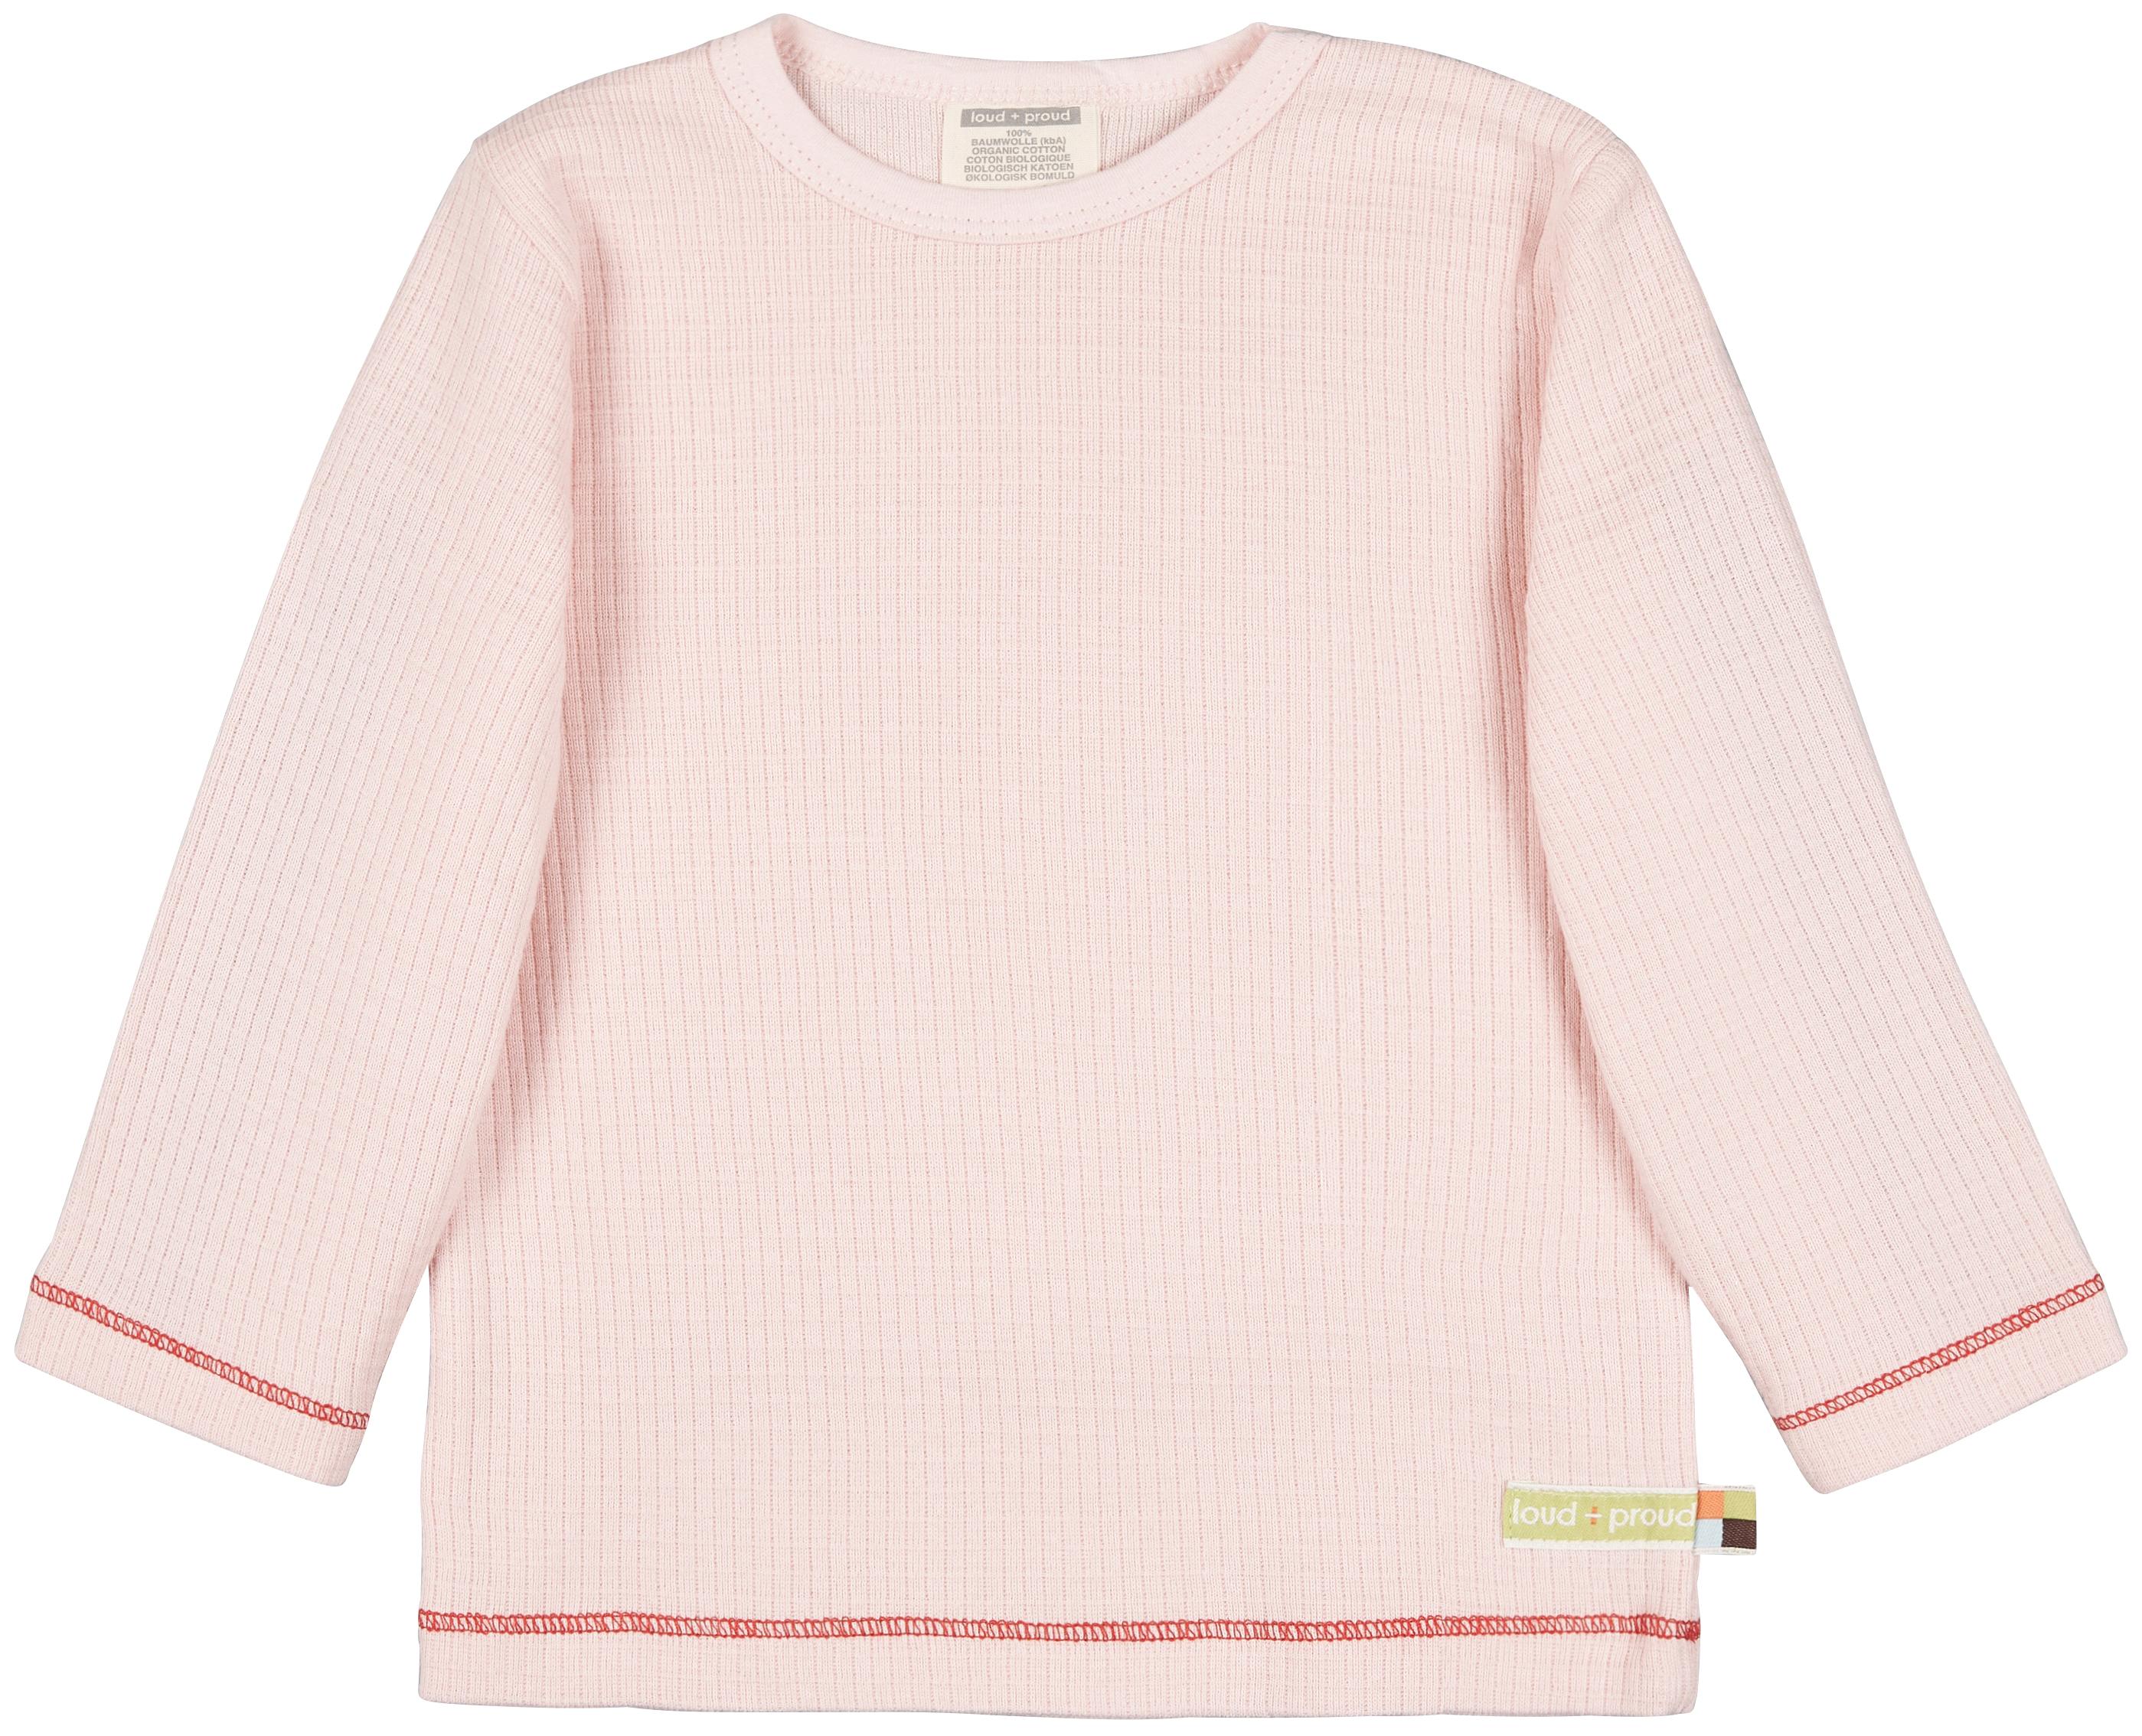 Langarmshirt, waffelstruktur, veerschiedene Farben